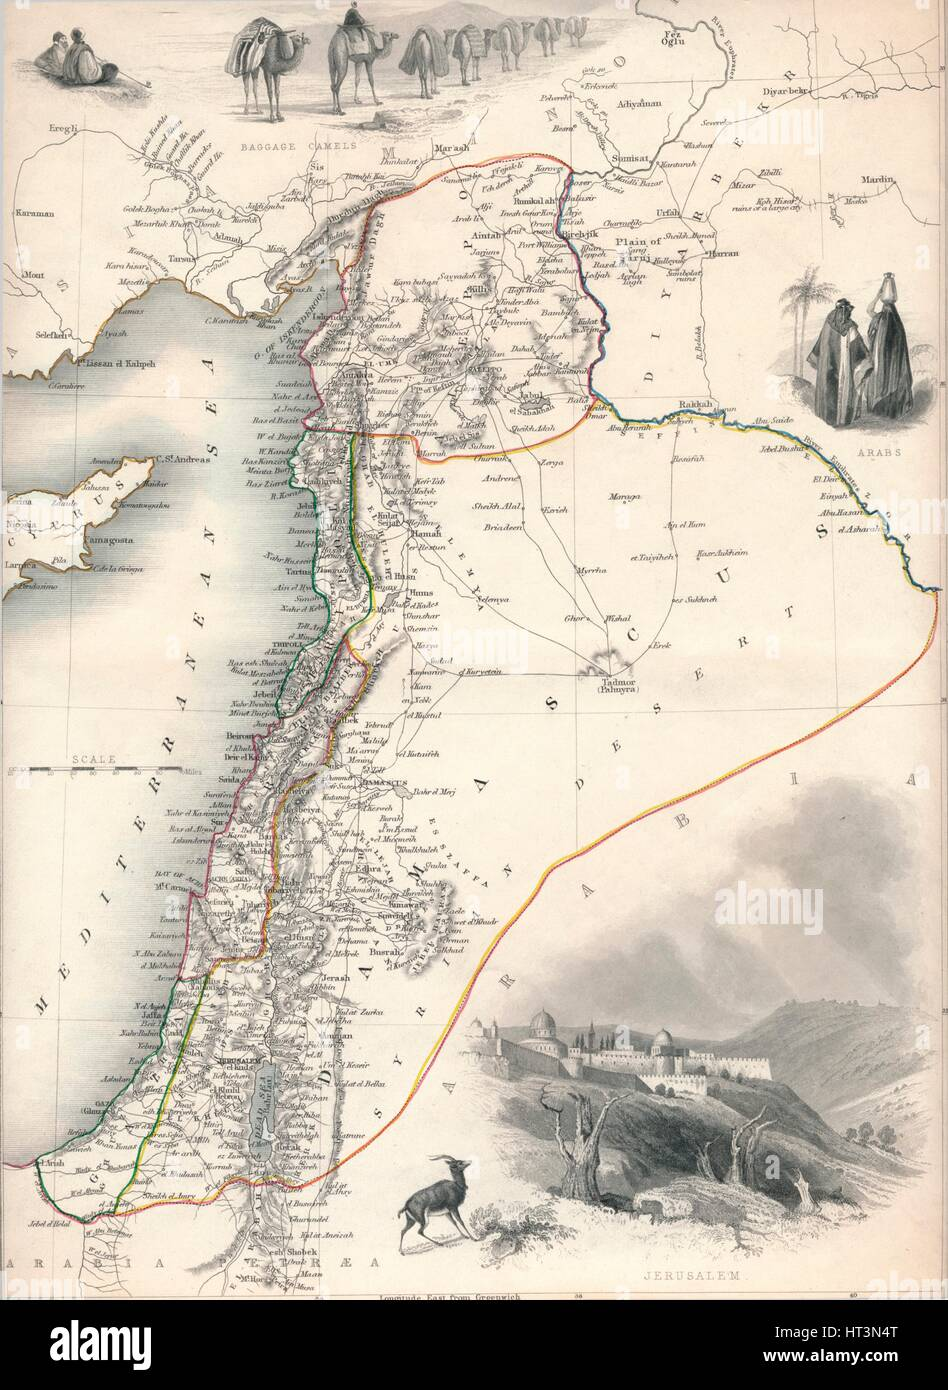 Map of Syria, 1851. Artist: John Tallis. - Stock Image